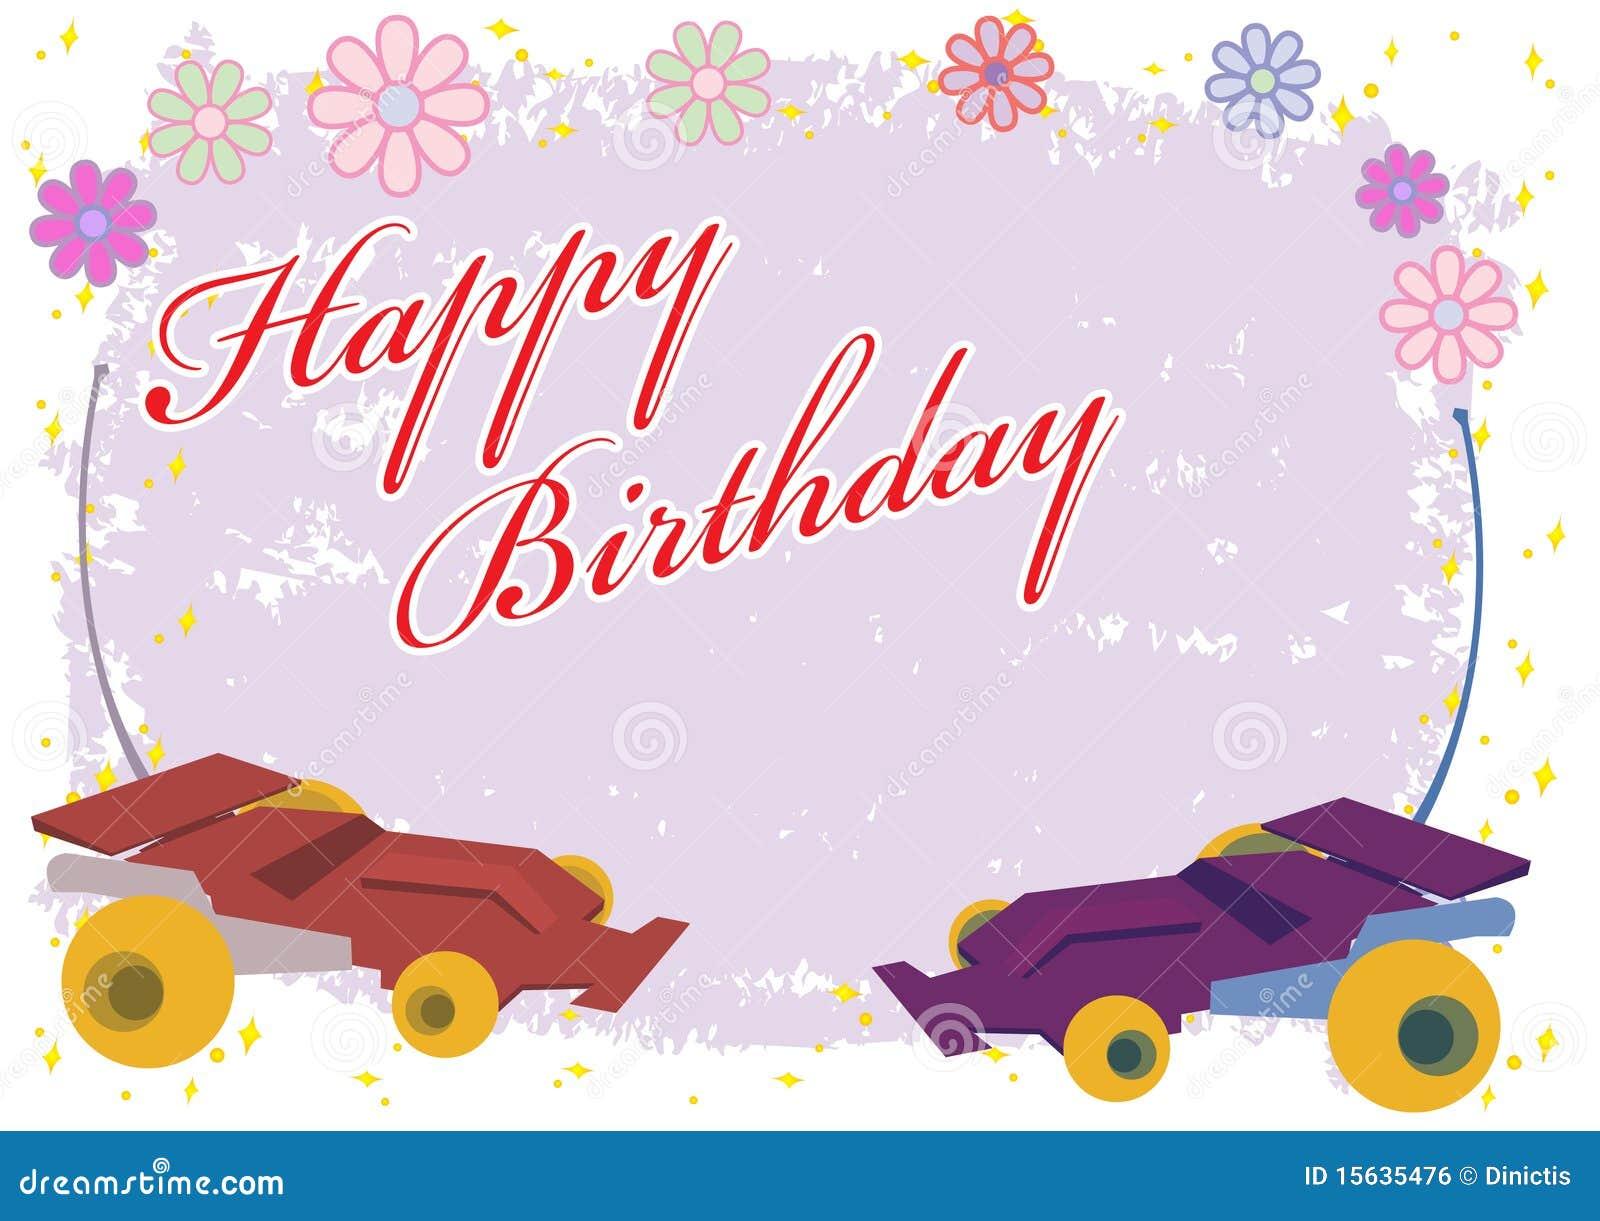 Happy Birthday Remote Control Car Royalty Free Stock Image